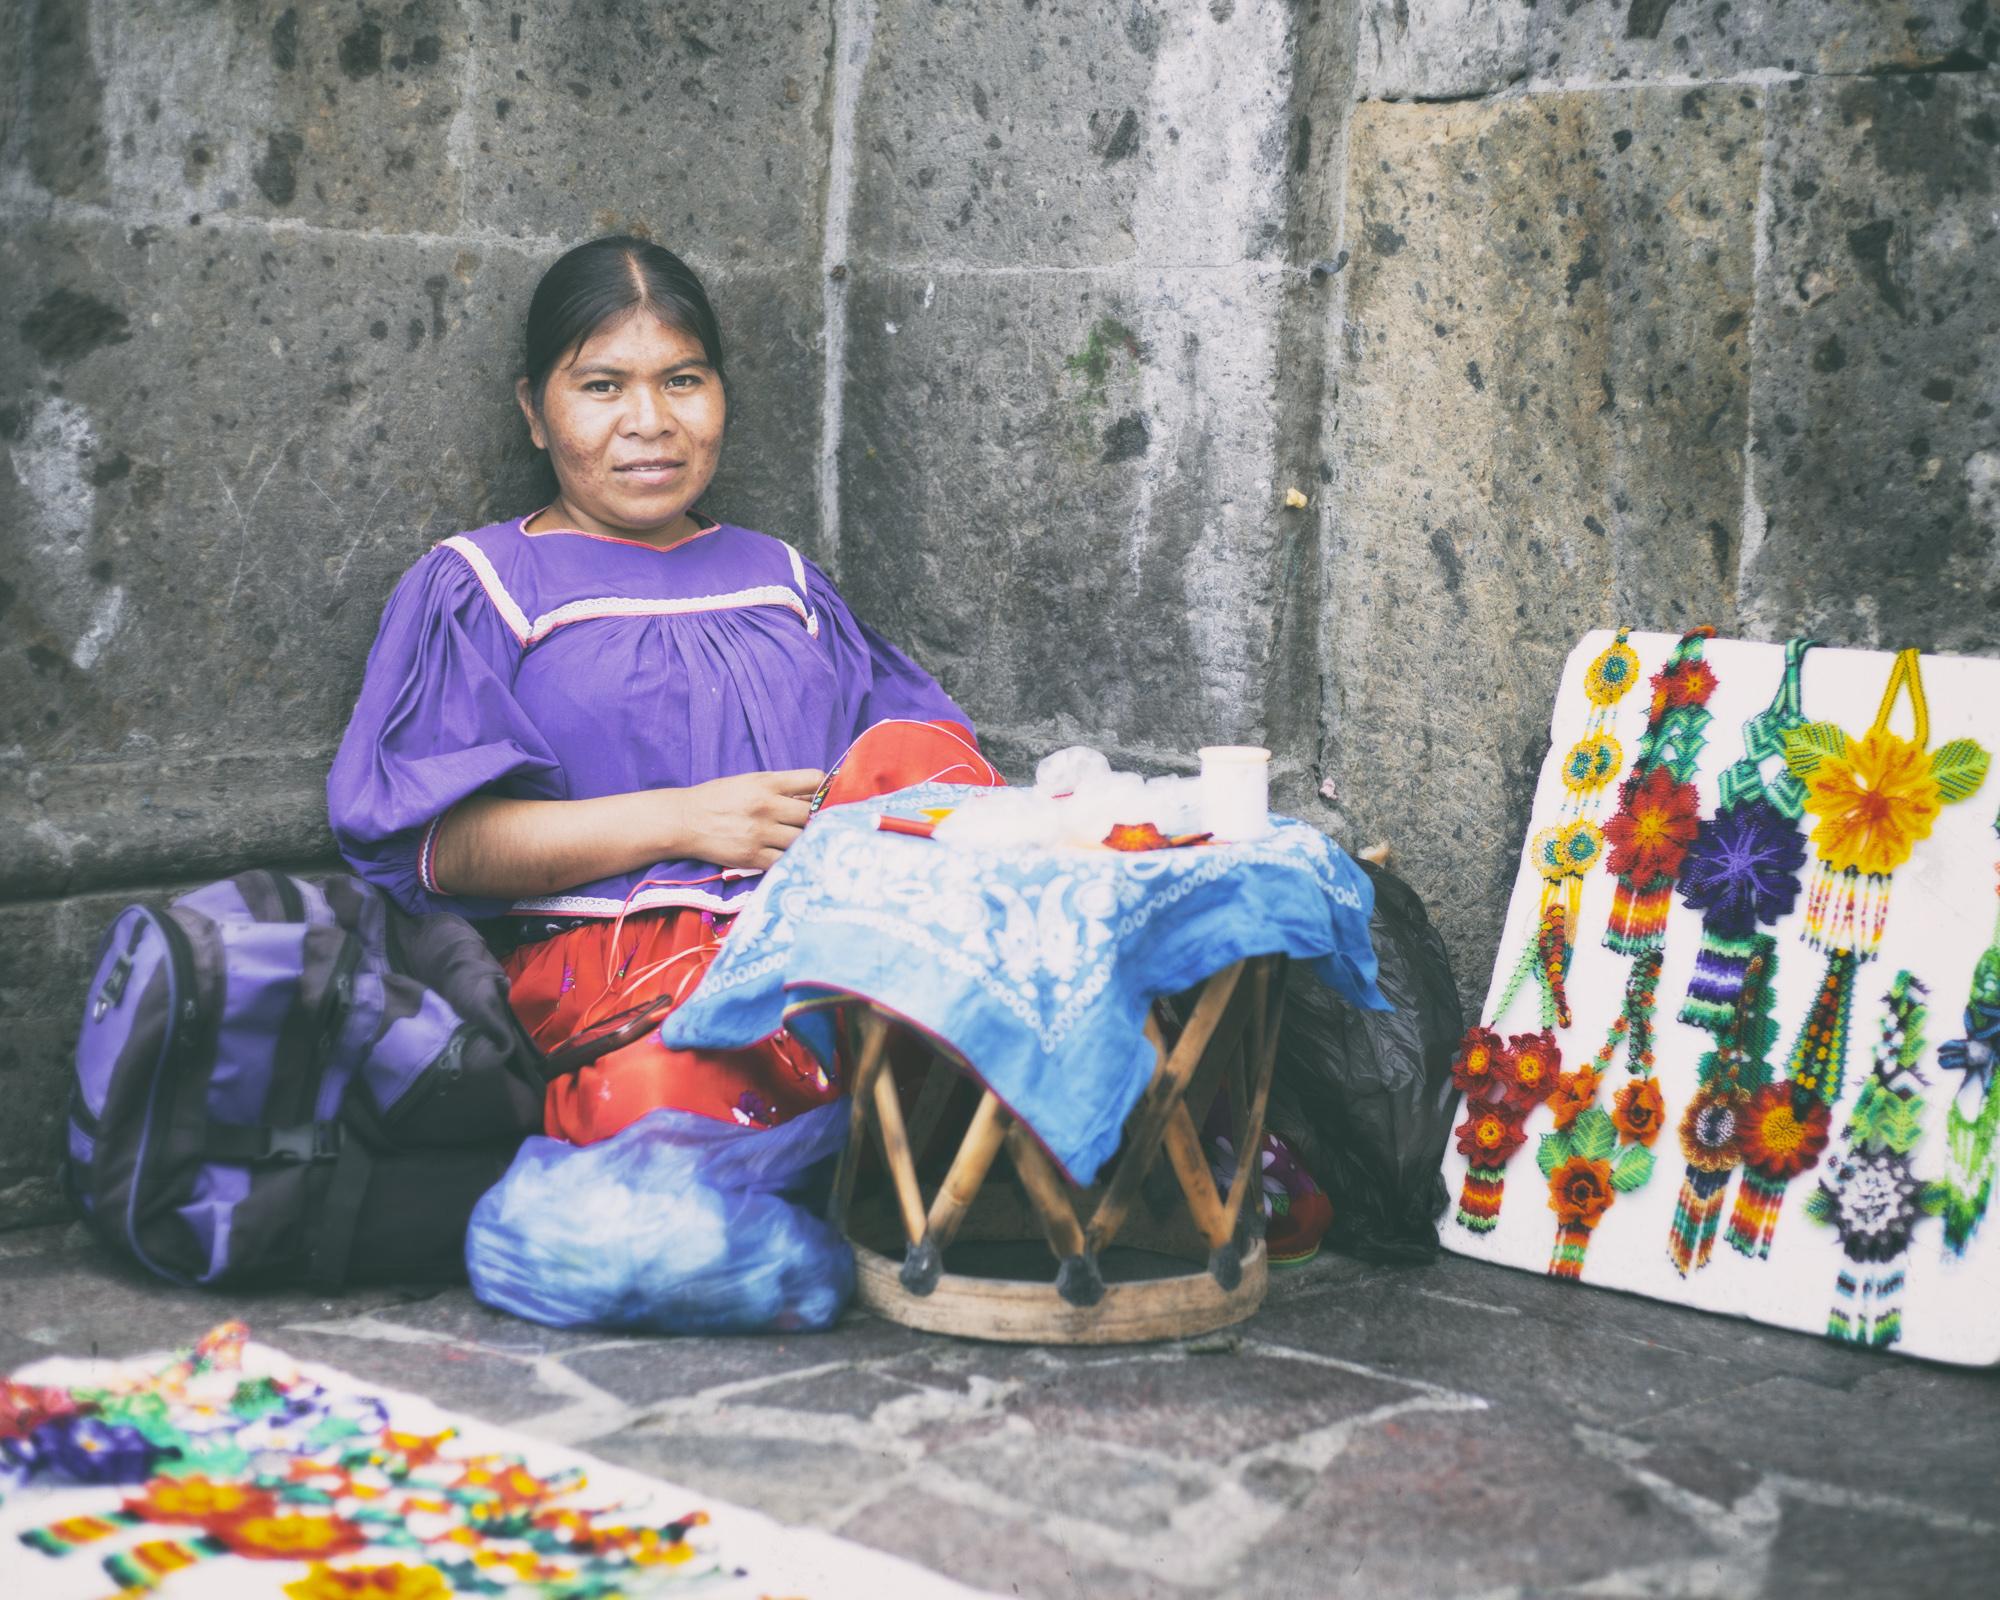 Mexico_009.jpg